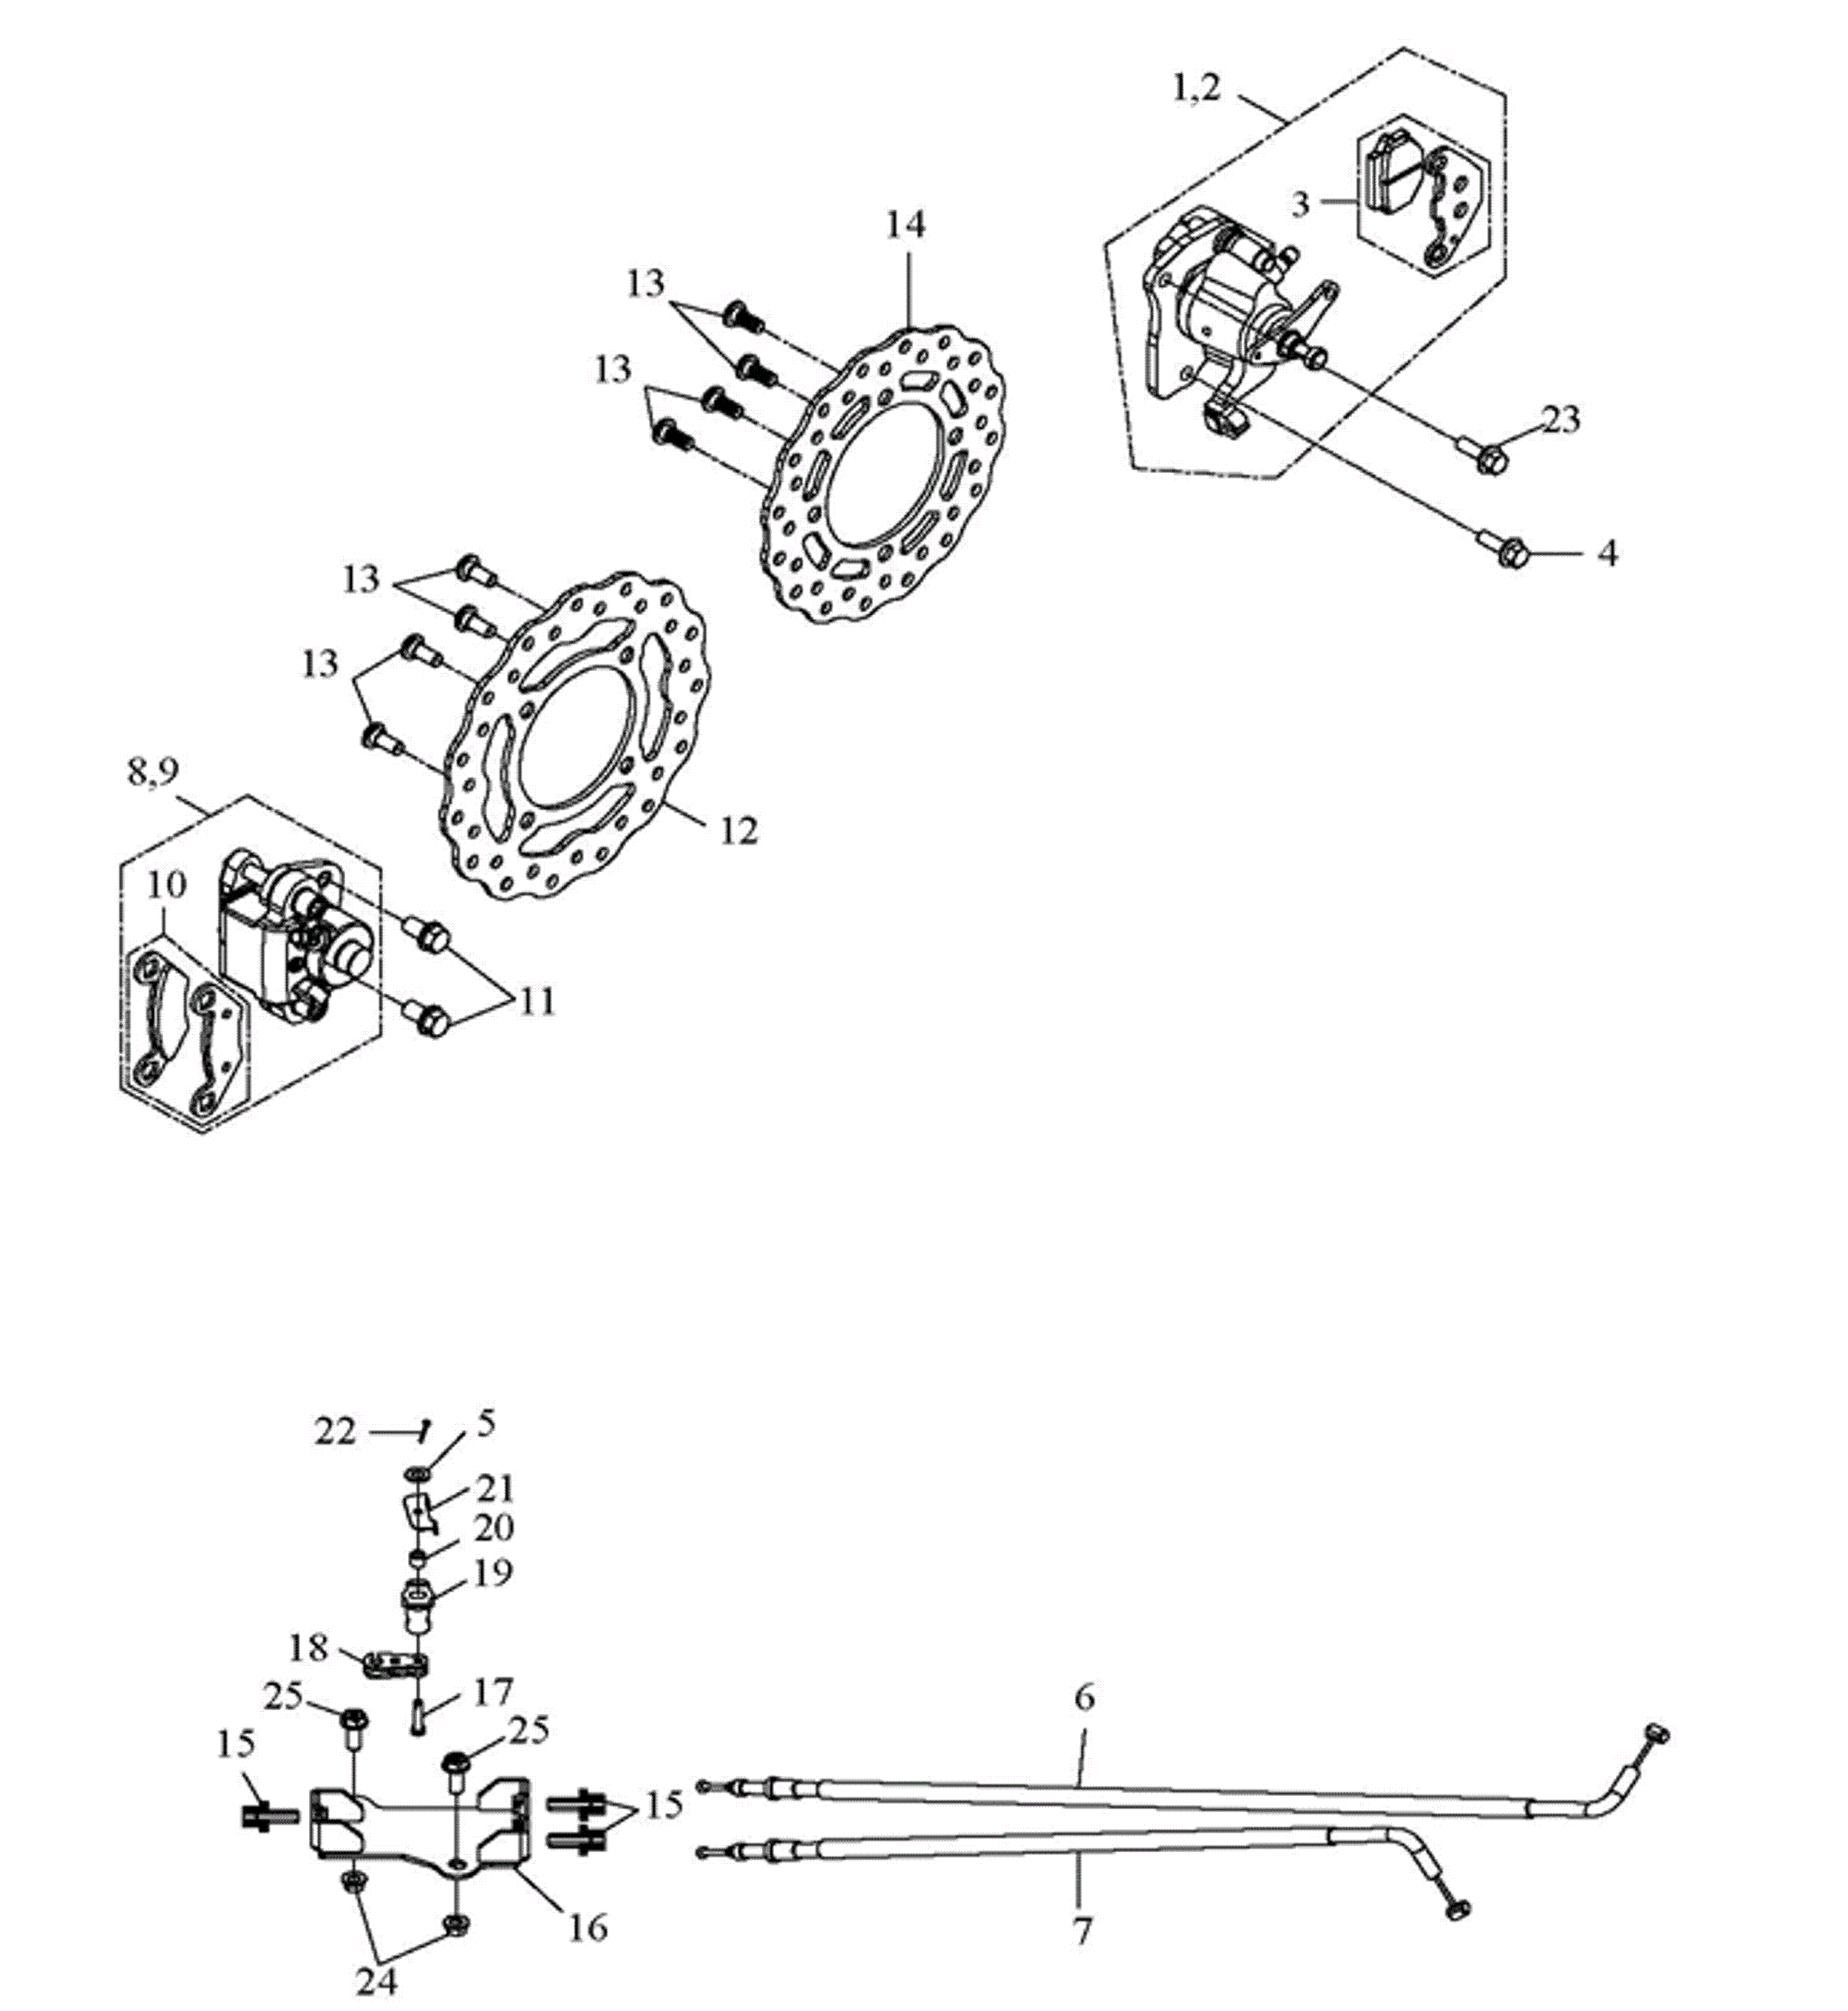 Bremsscheiben, Bremssättel (LoF)